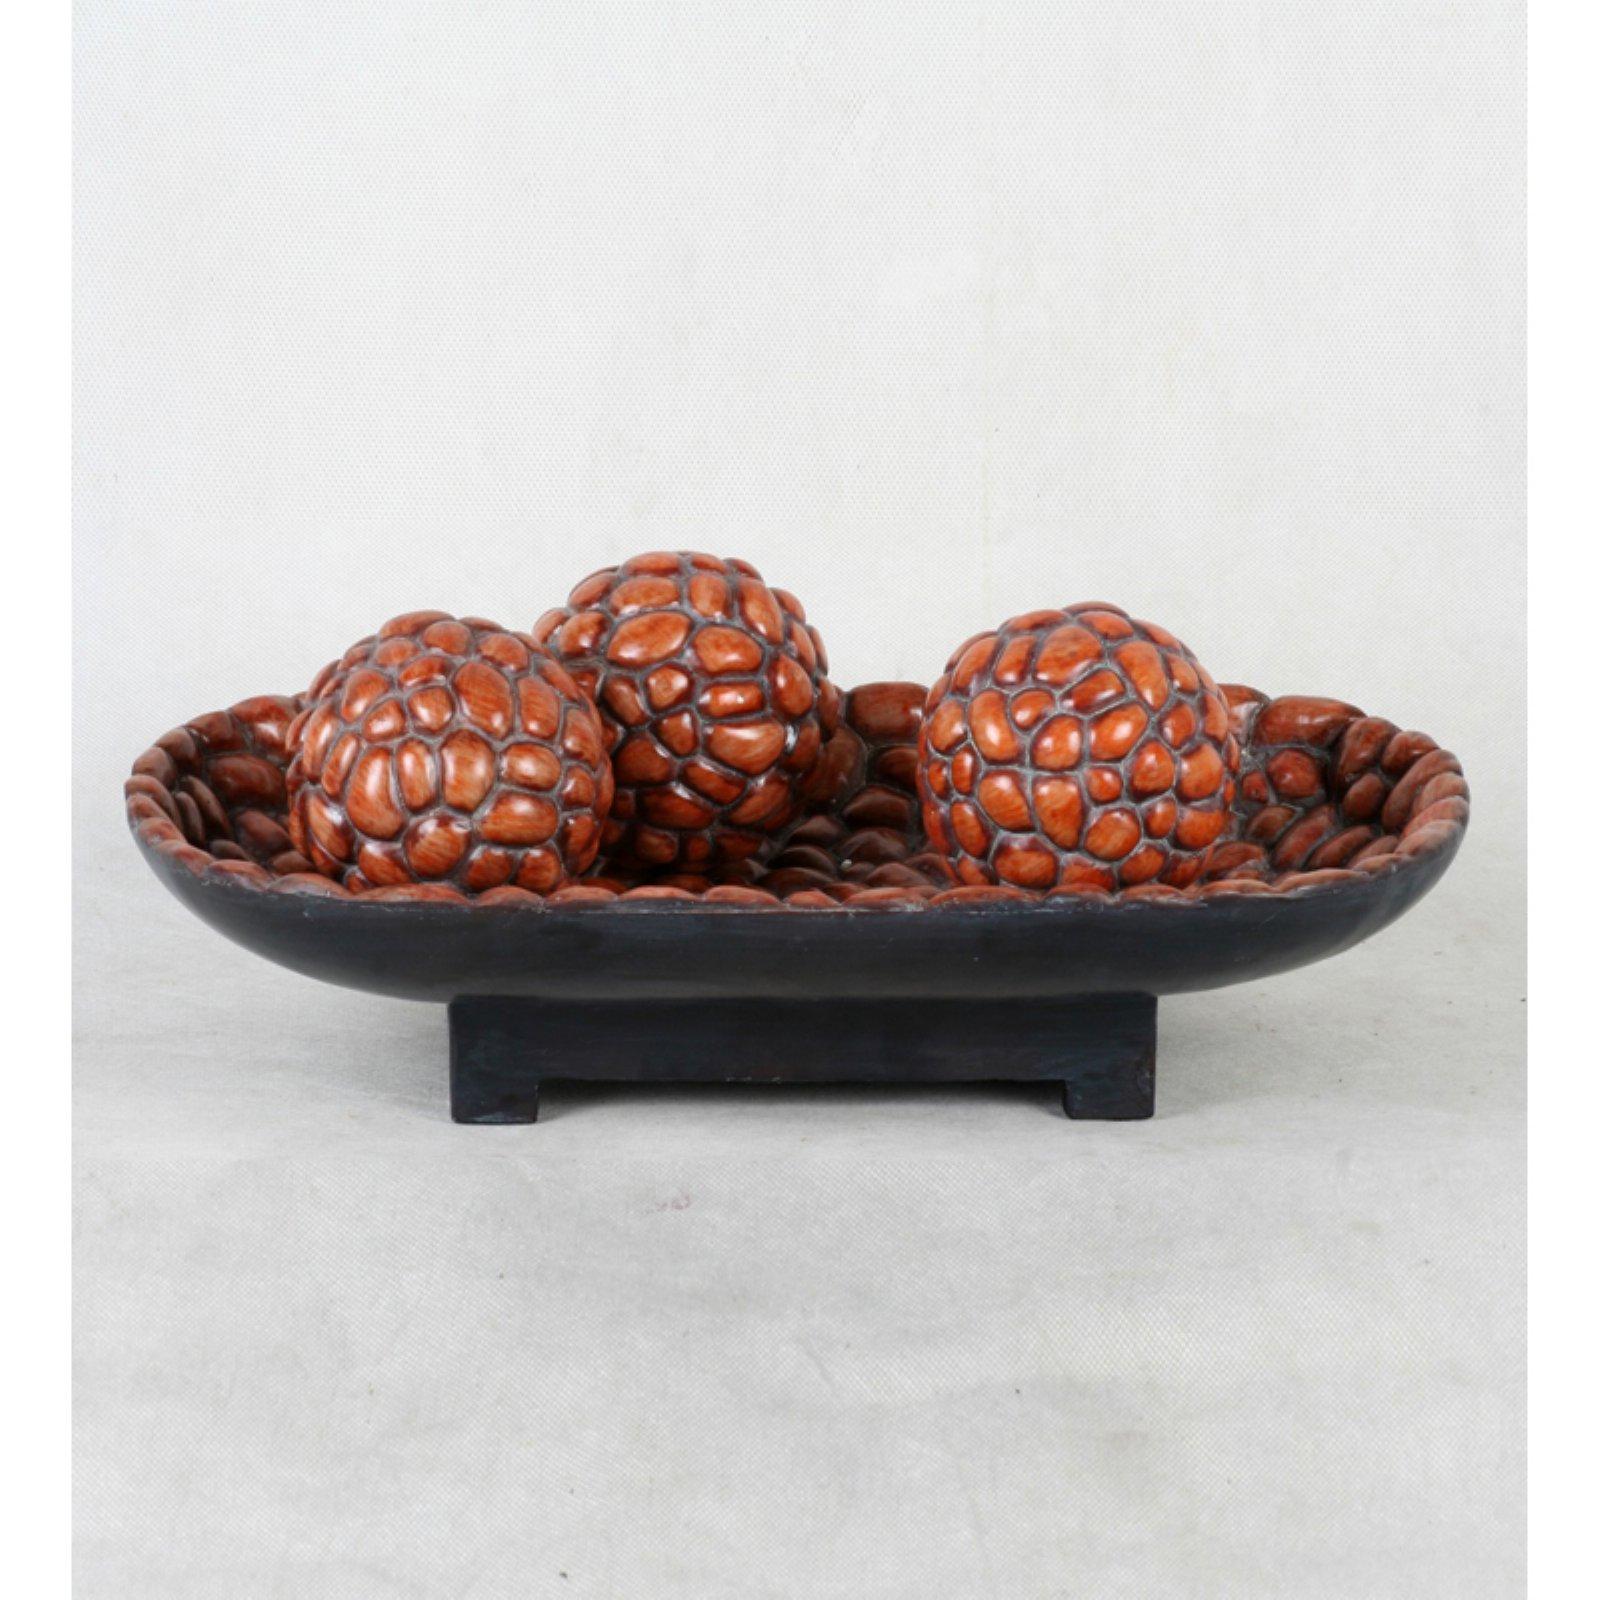 Privilege International 3 Sphere Decorative Bowl